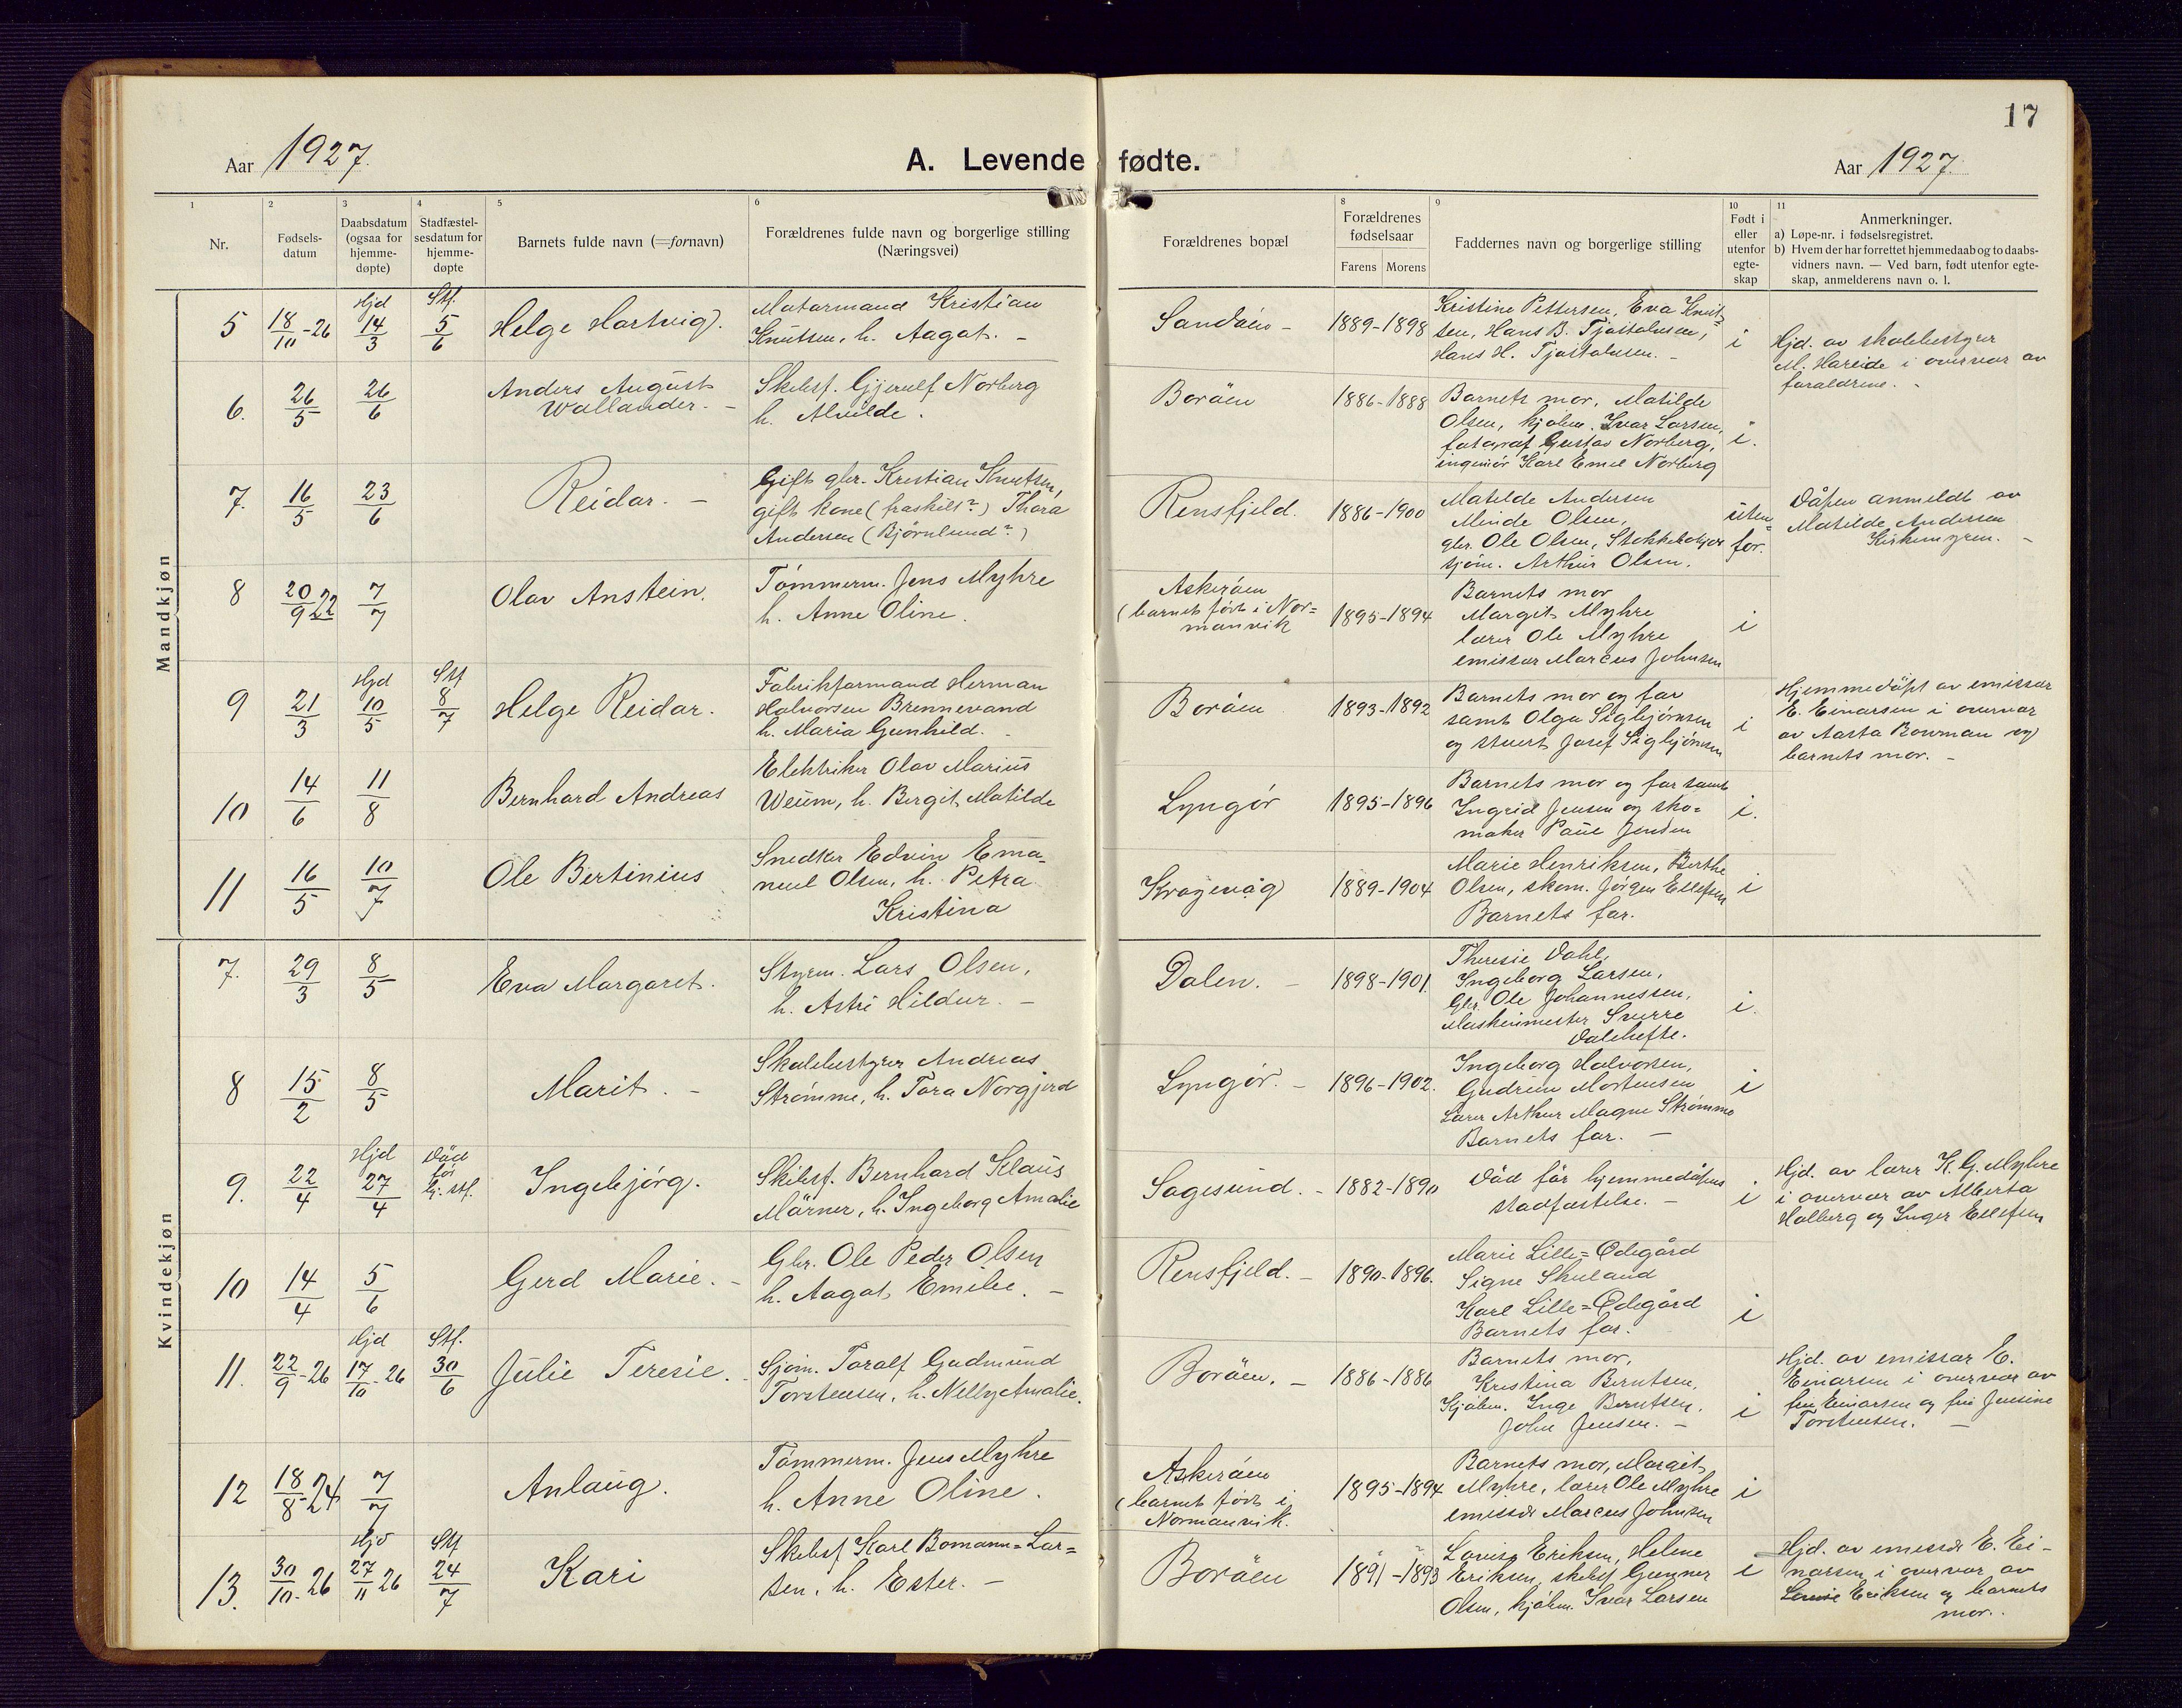 SAK, Dypvåg sokneprestkontor, F/Fb/Fba/L0015: Parish register (copy) no. B 15, 1922-1949, p. 17